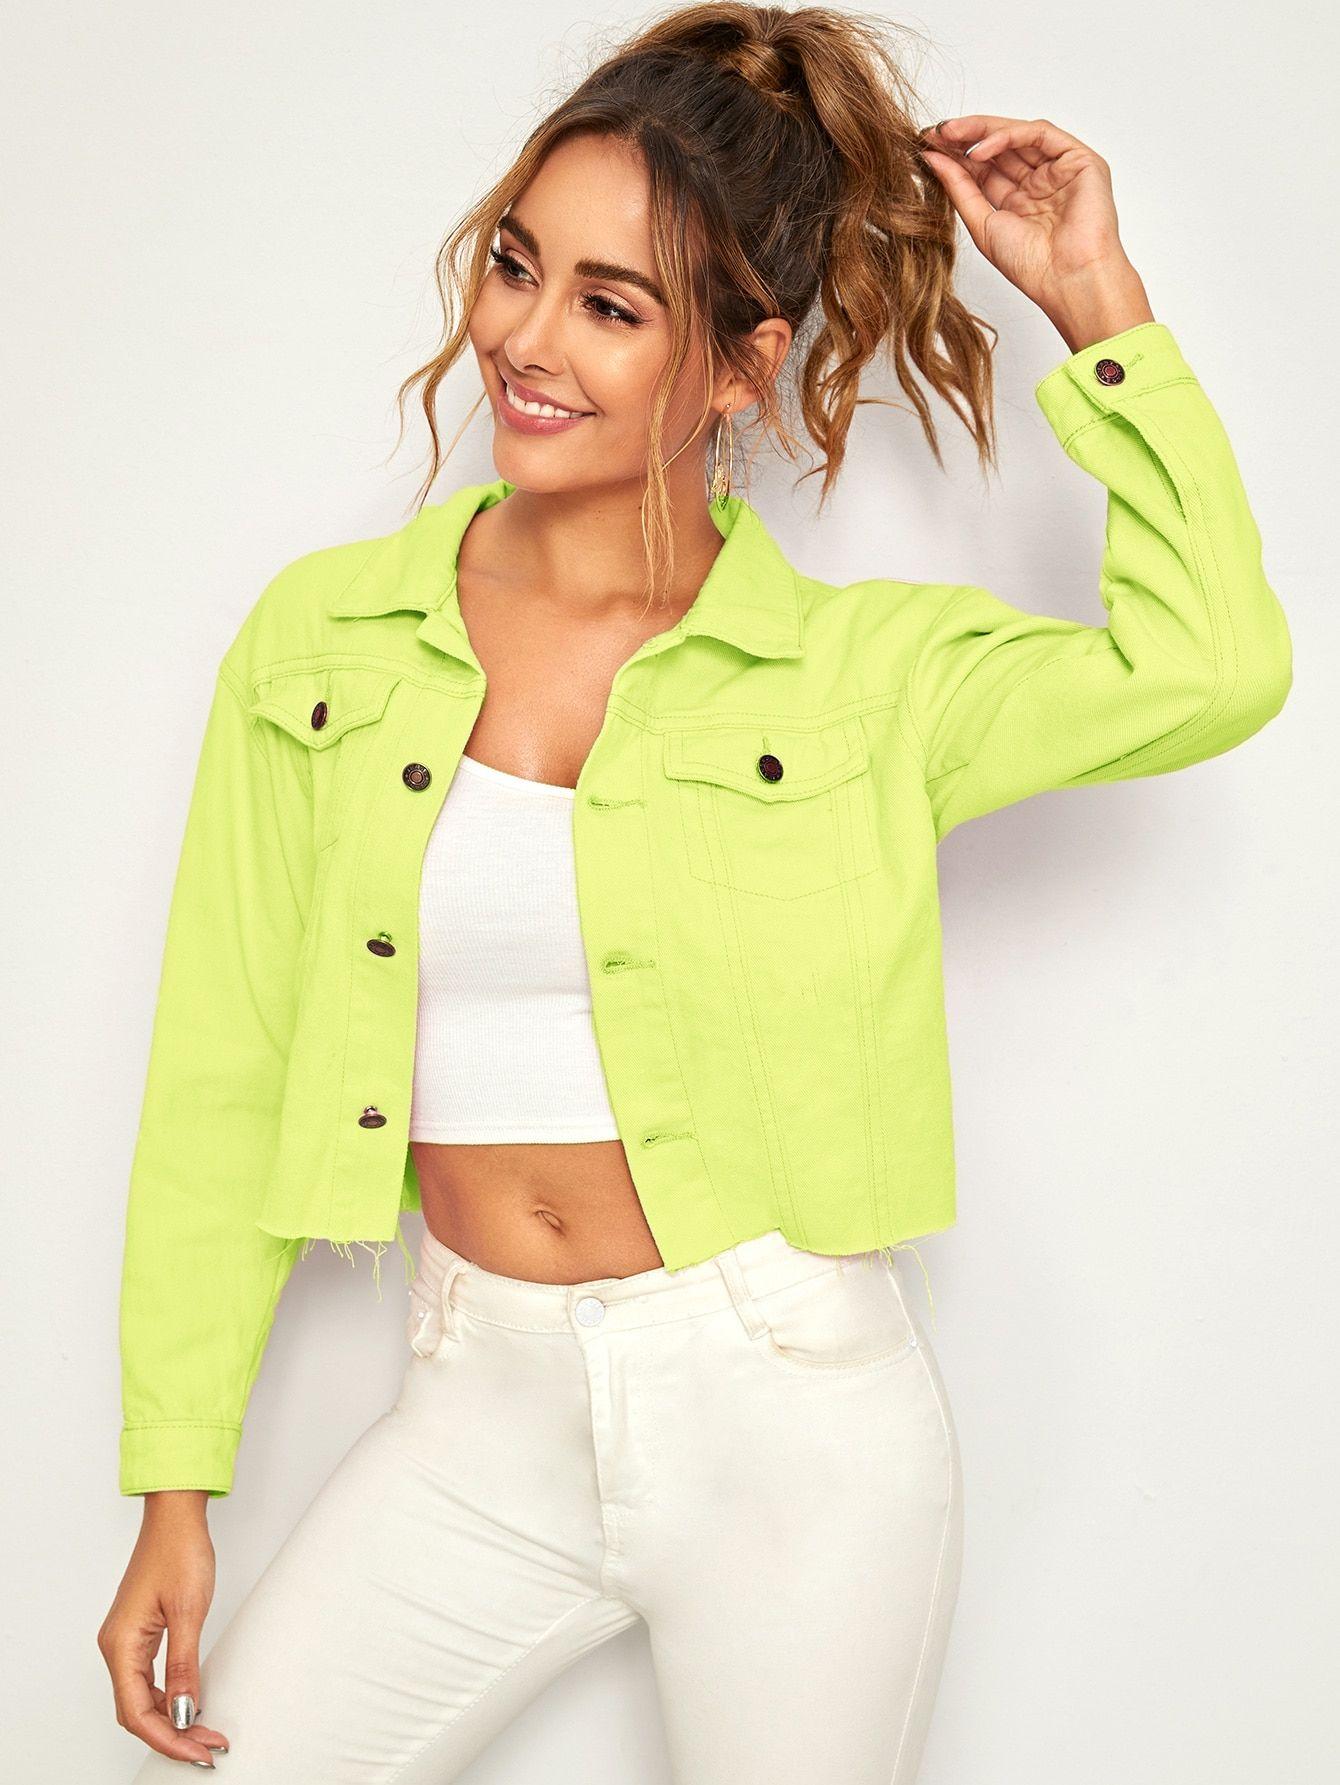 Ad Neon Green Raw Hem Crop Denim Jacket Tags Casual Green Bright Plain Collar Crop Other Raw Hem Cropped Denim Jacket Denim Jacket Leggings Fashion [ 1785 x 1340 Pixel ]